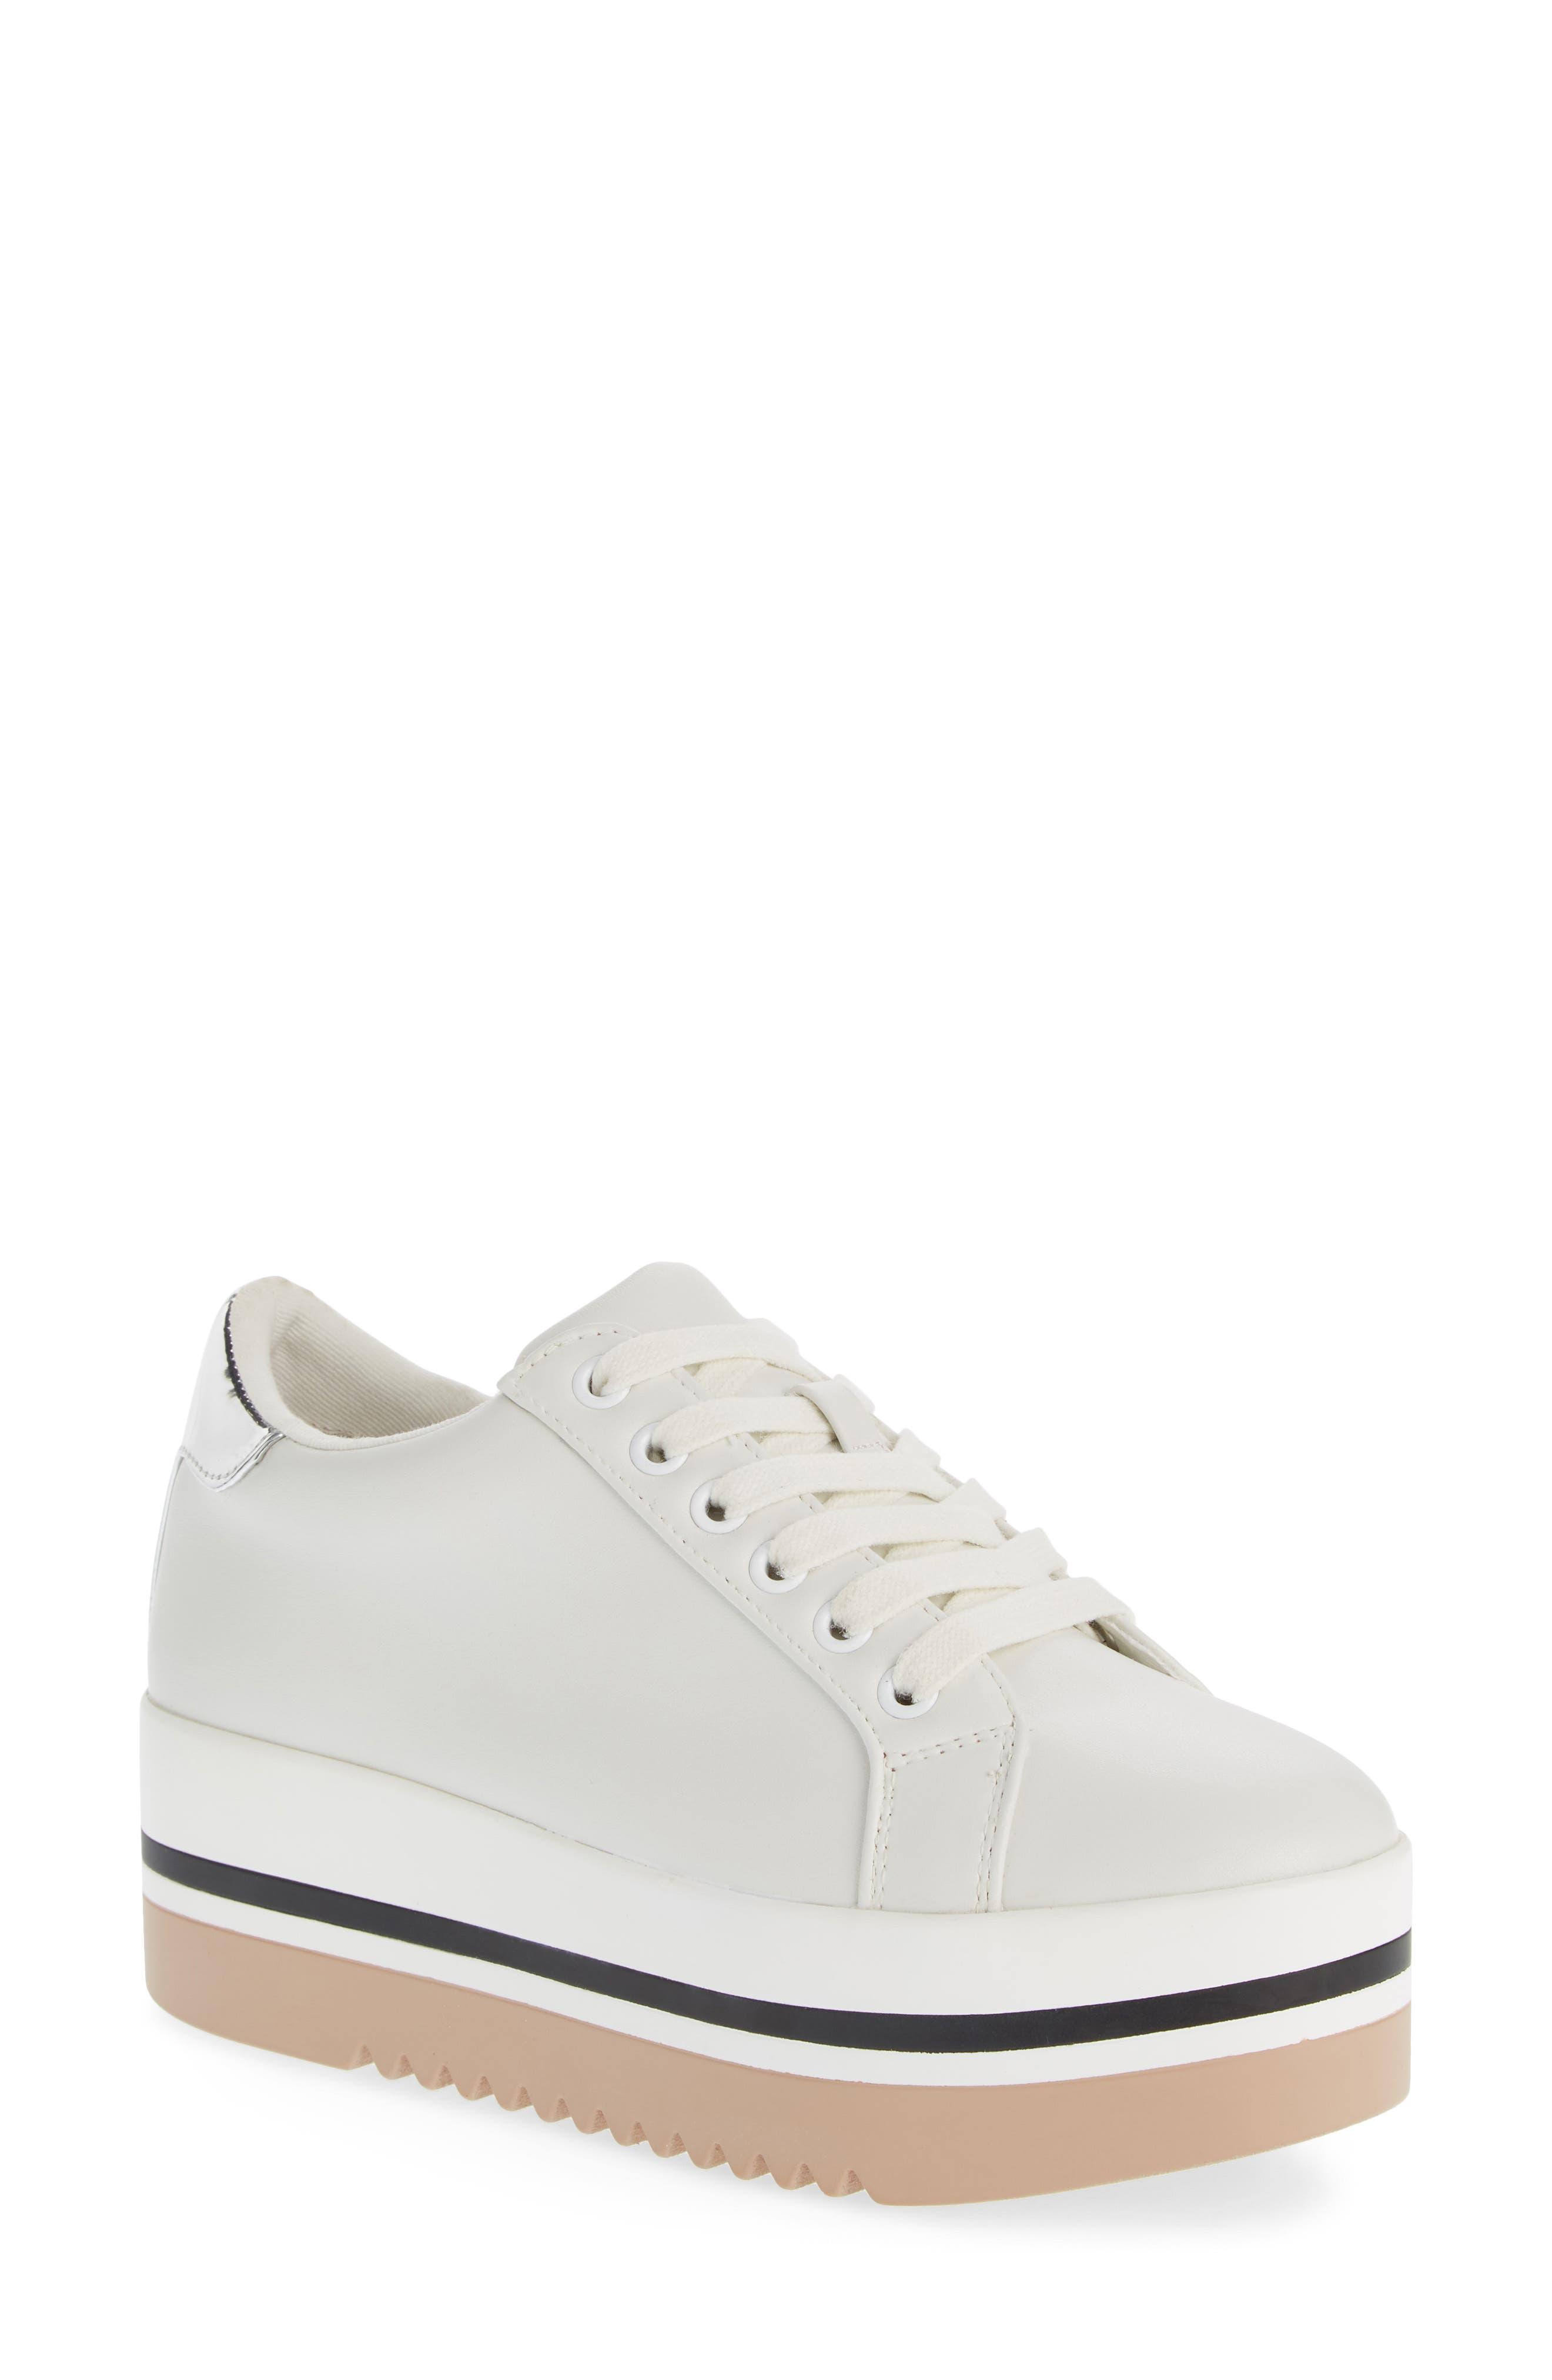 Alley Platform Sneaker,                         Main,                         color, WHITE